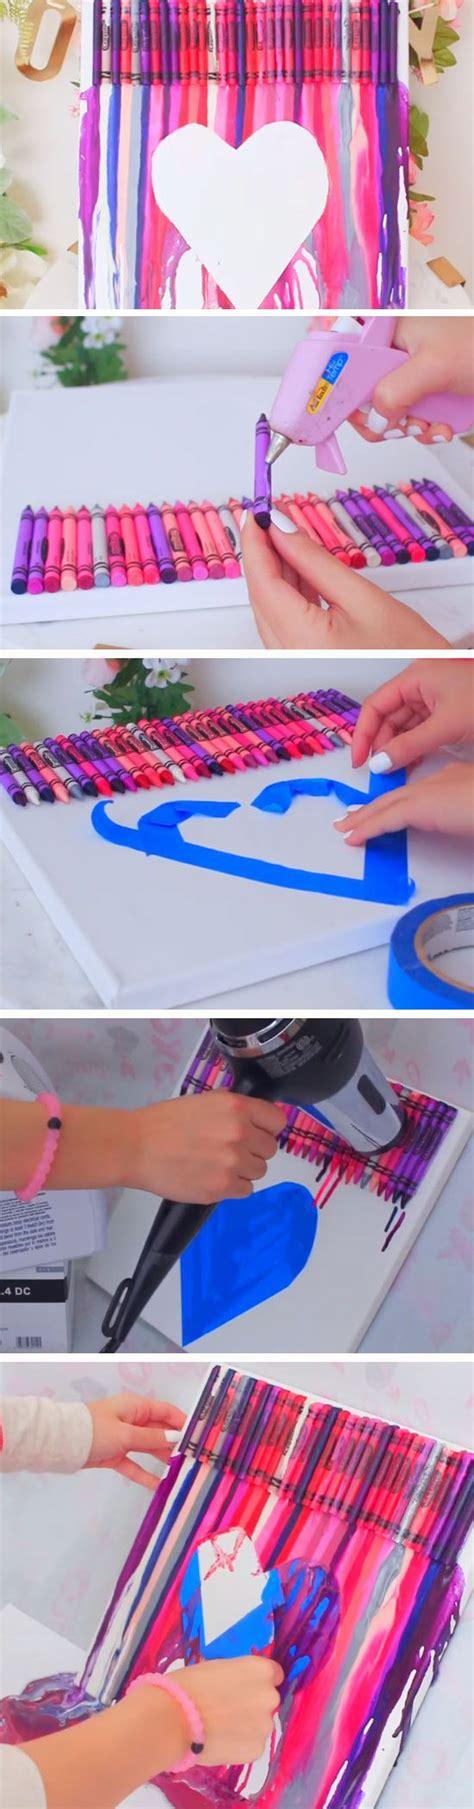 Handmade Birthday Gifts For Him - best 25 boyfriend gifts ideas on